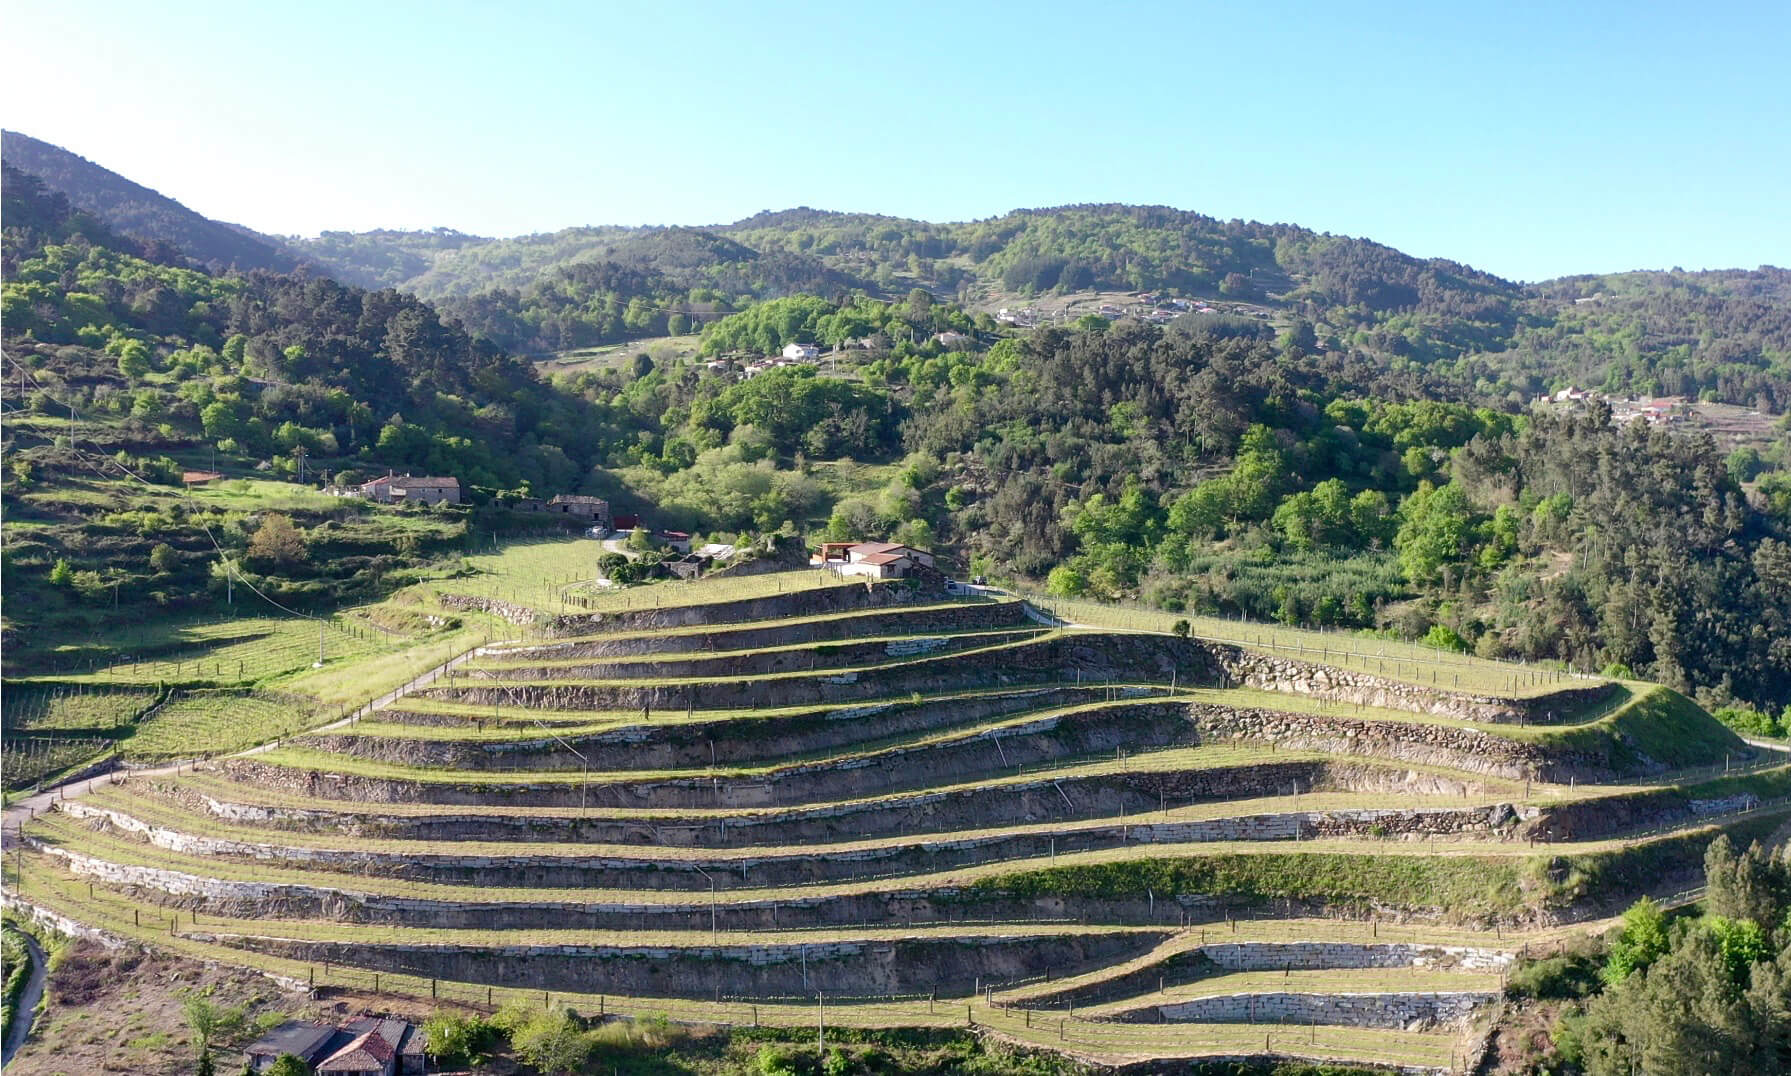 Fazenda Pradio vineyard in Chantada, a colder sub zone of Ribeira Sacra